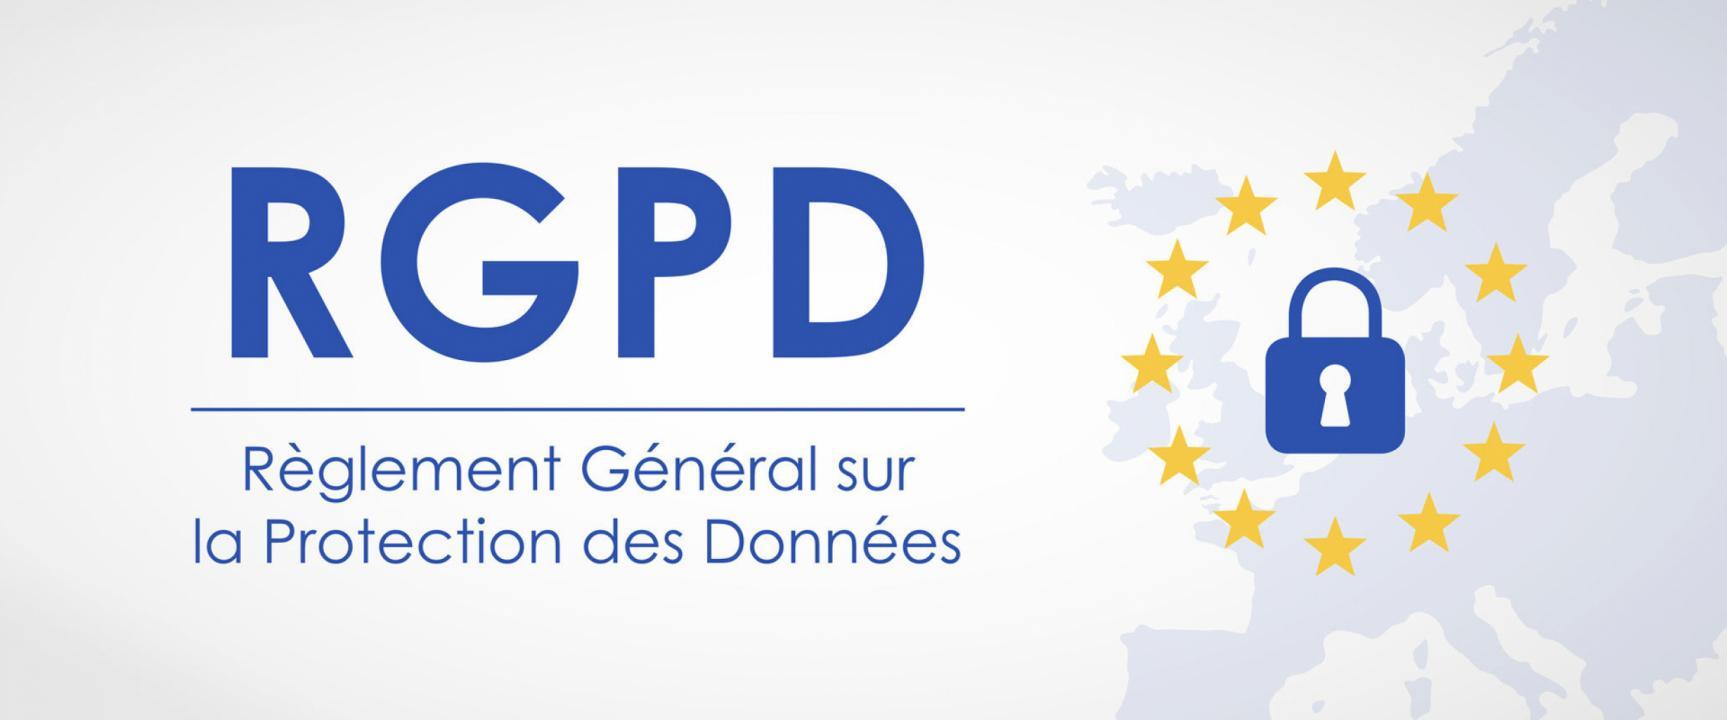 Reglementation Europeenne Rgpd 191320164305/ Mentions Légales